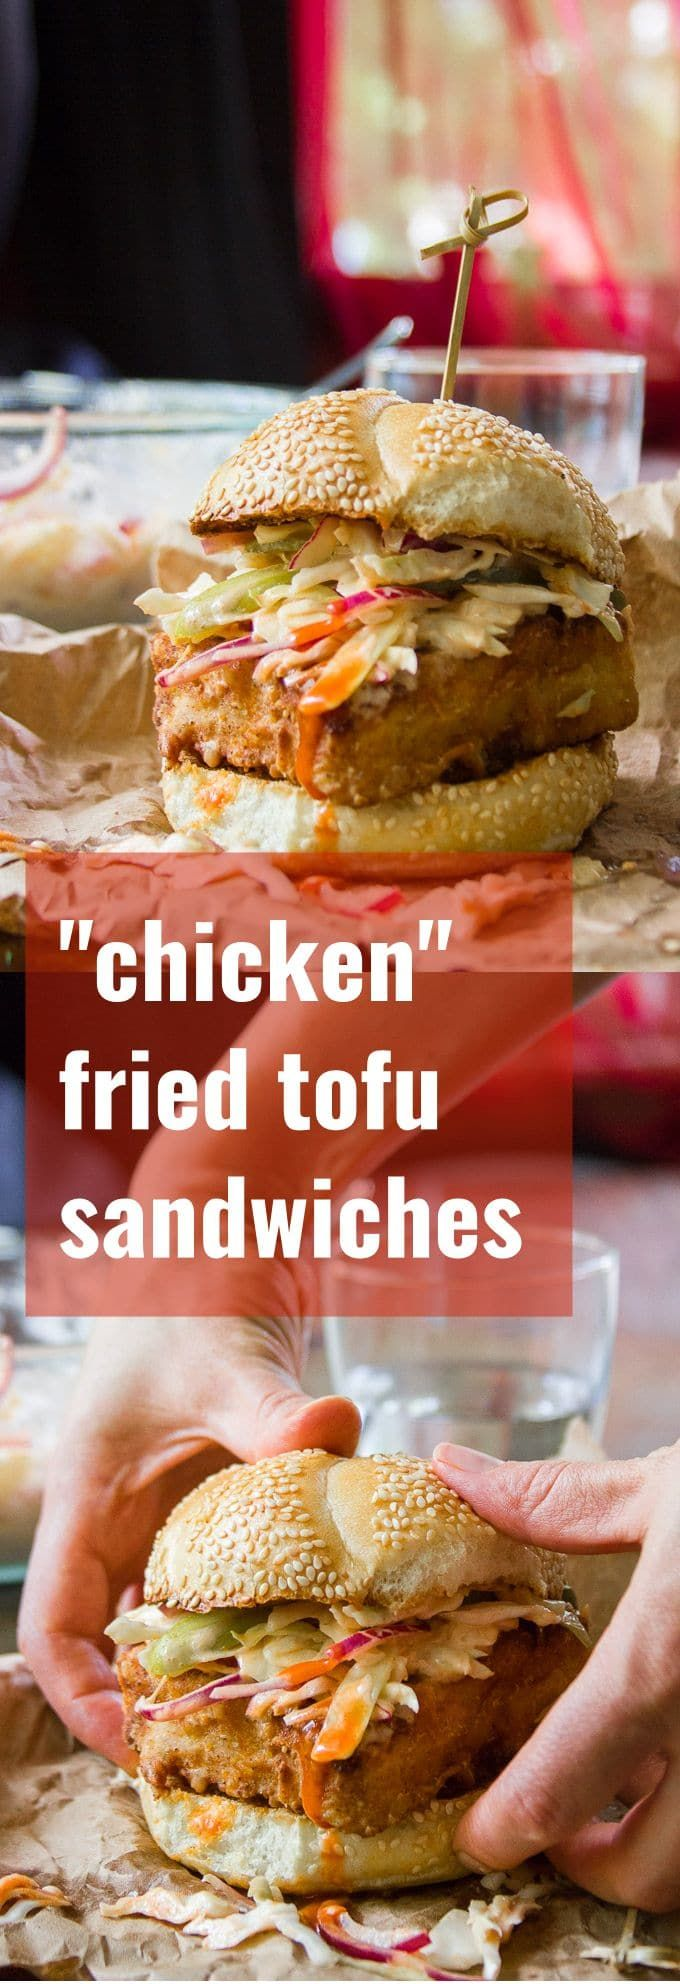 Chicken Fried Tofu Sandwiches with Spicy Buffalo Slaw - Connoisseurus Veg